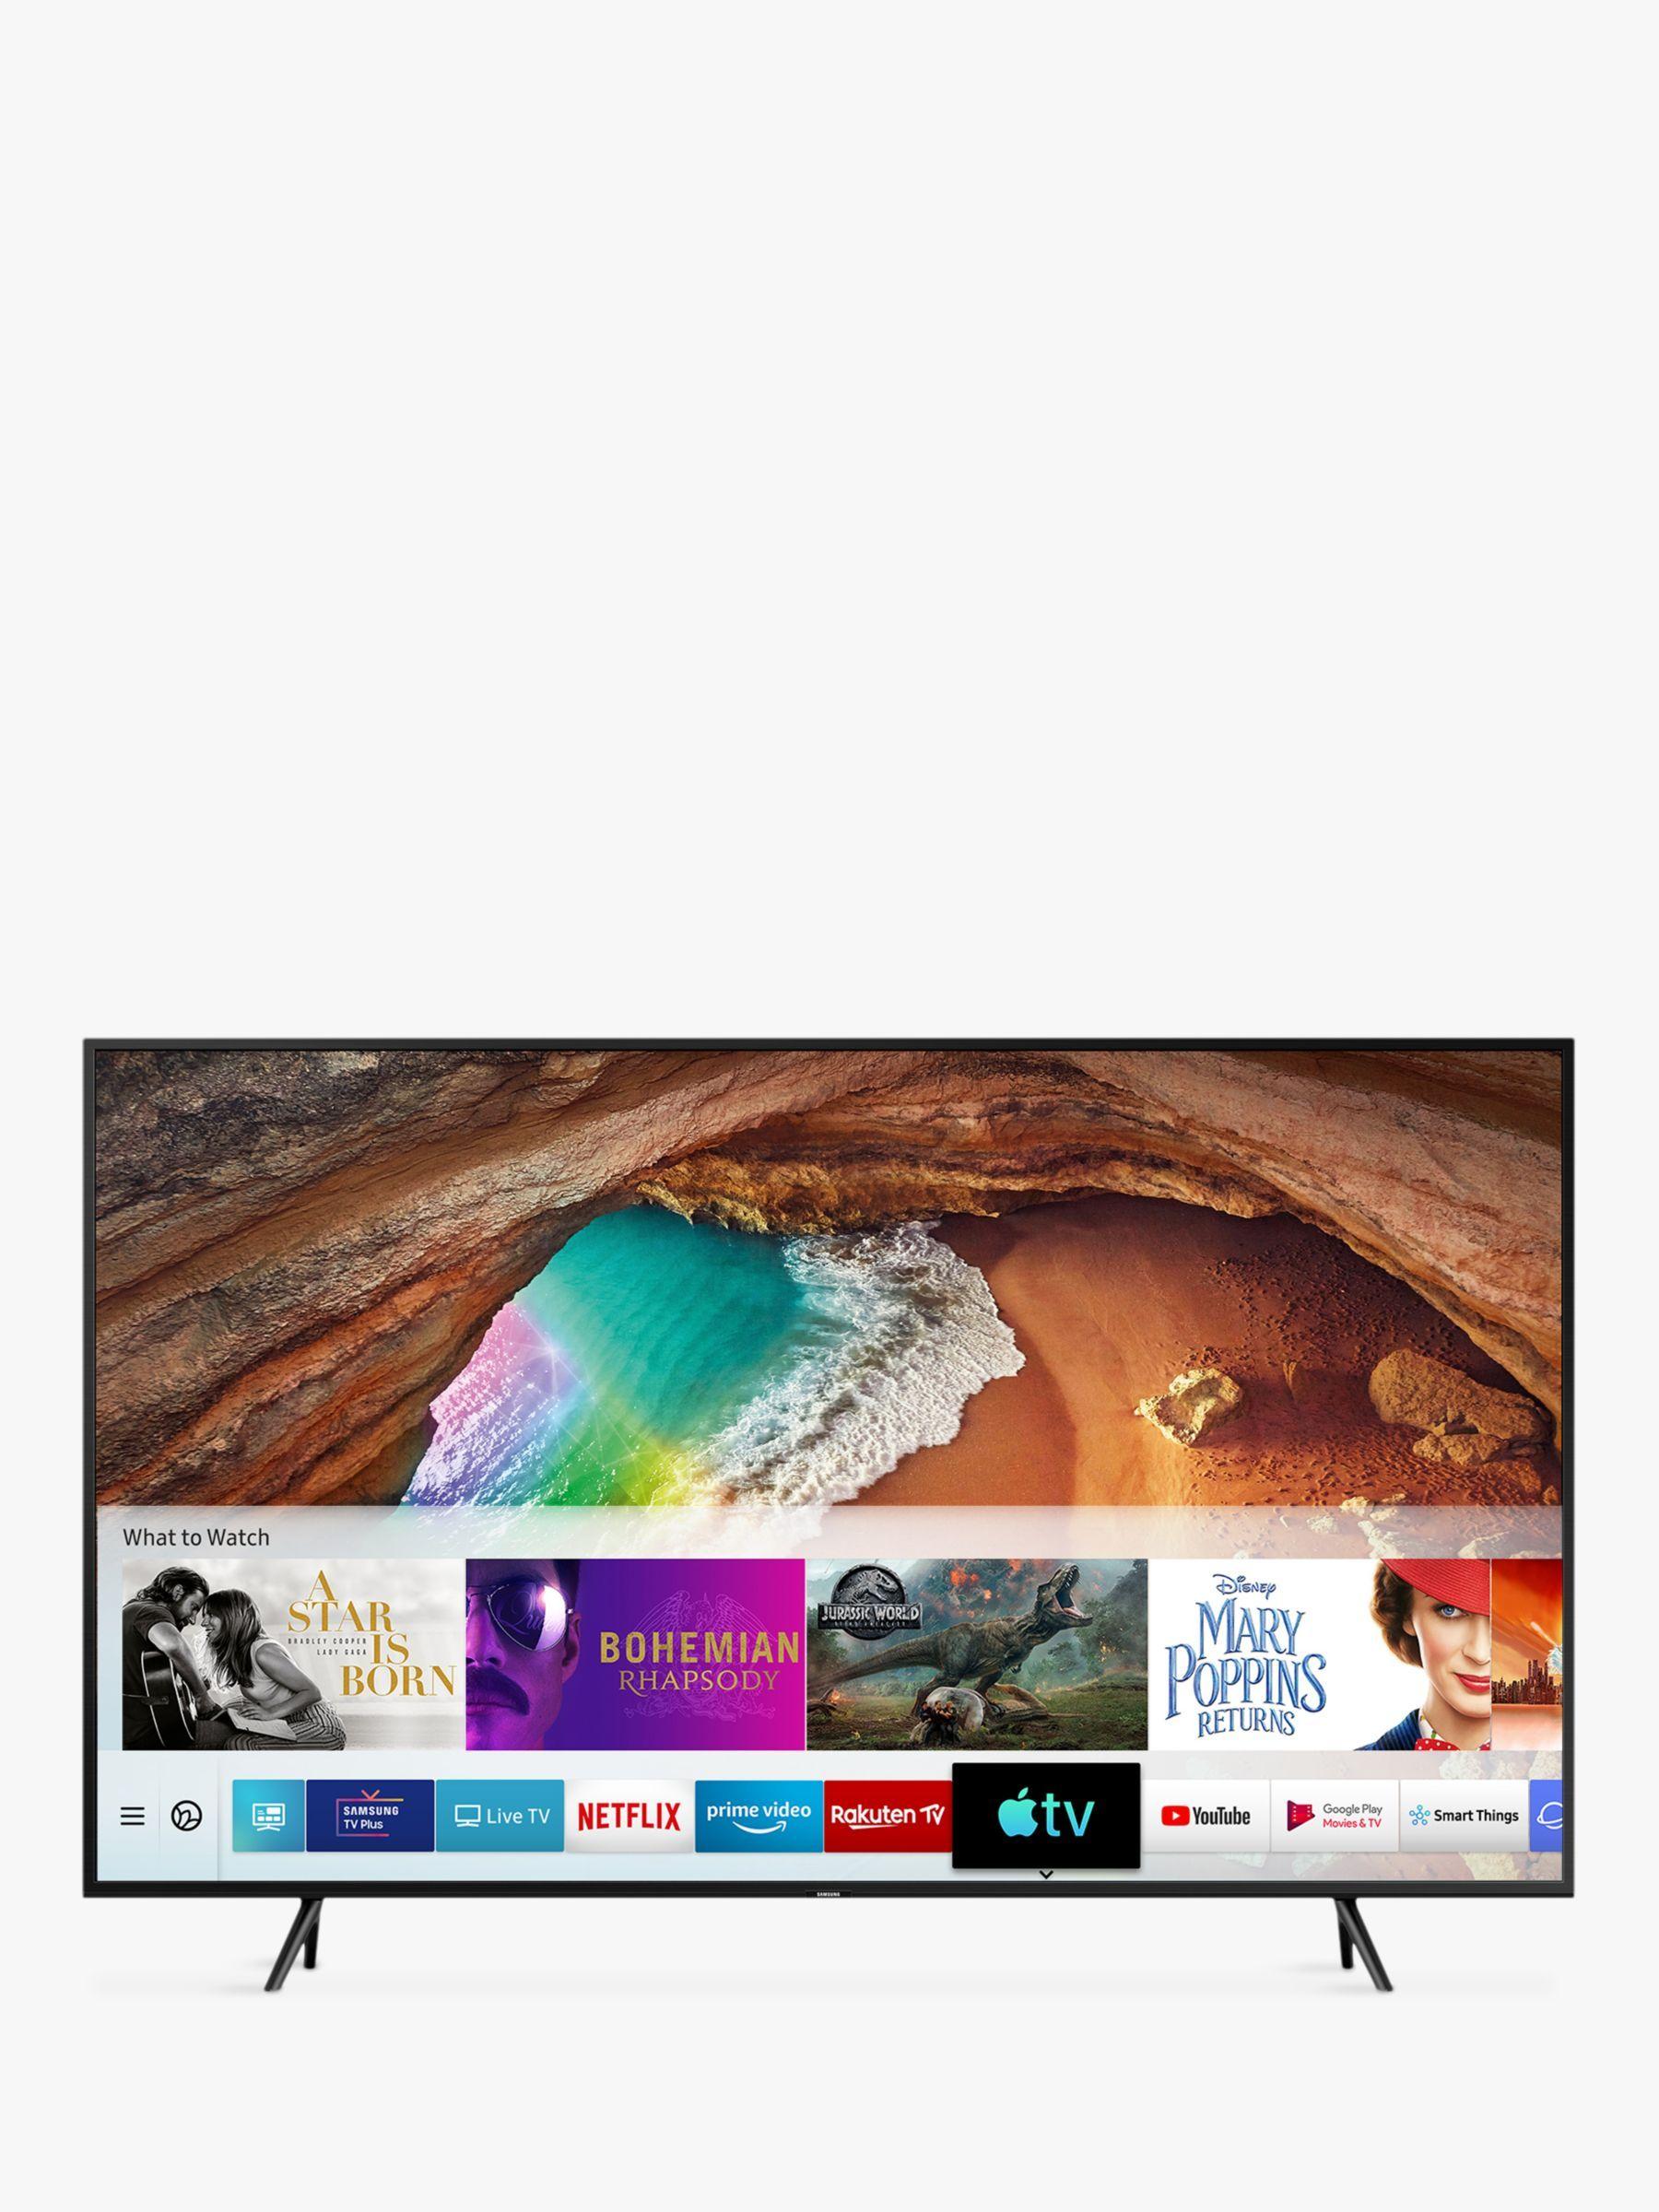 Samsung Qe55q60r 2019 Qled Hdr 4k Ultra Hd Smart Tv 55 With